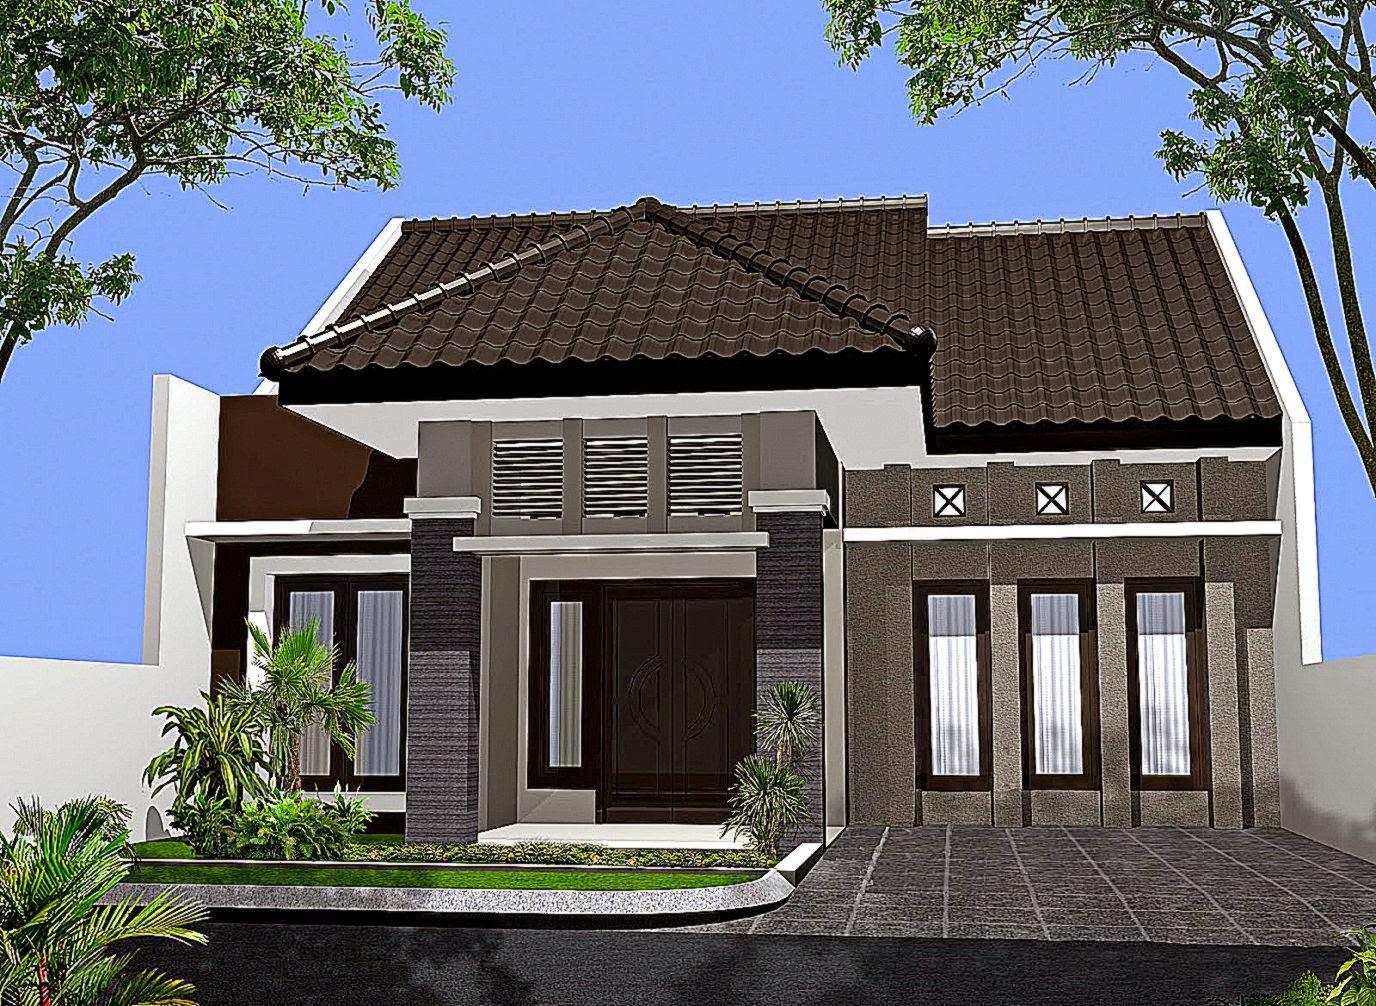 Reka bentuk rumah sederhana mewah 4 bilik